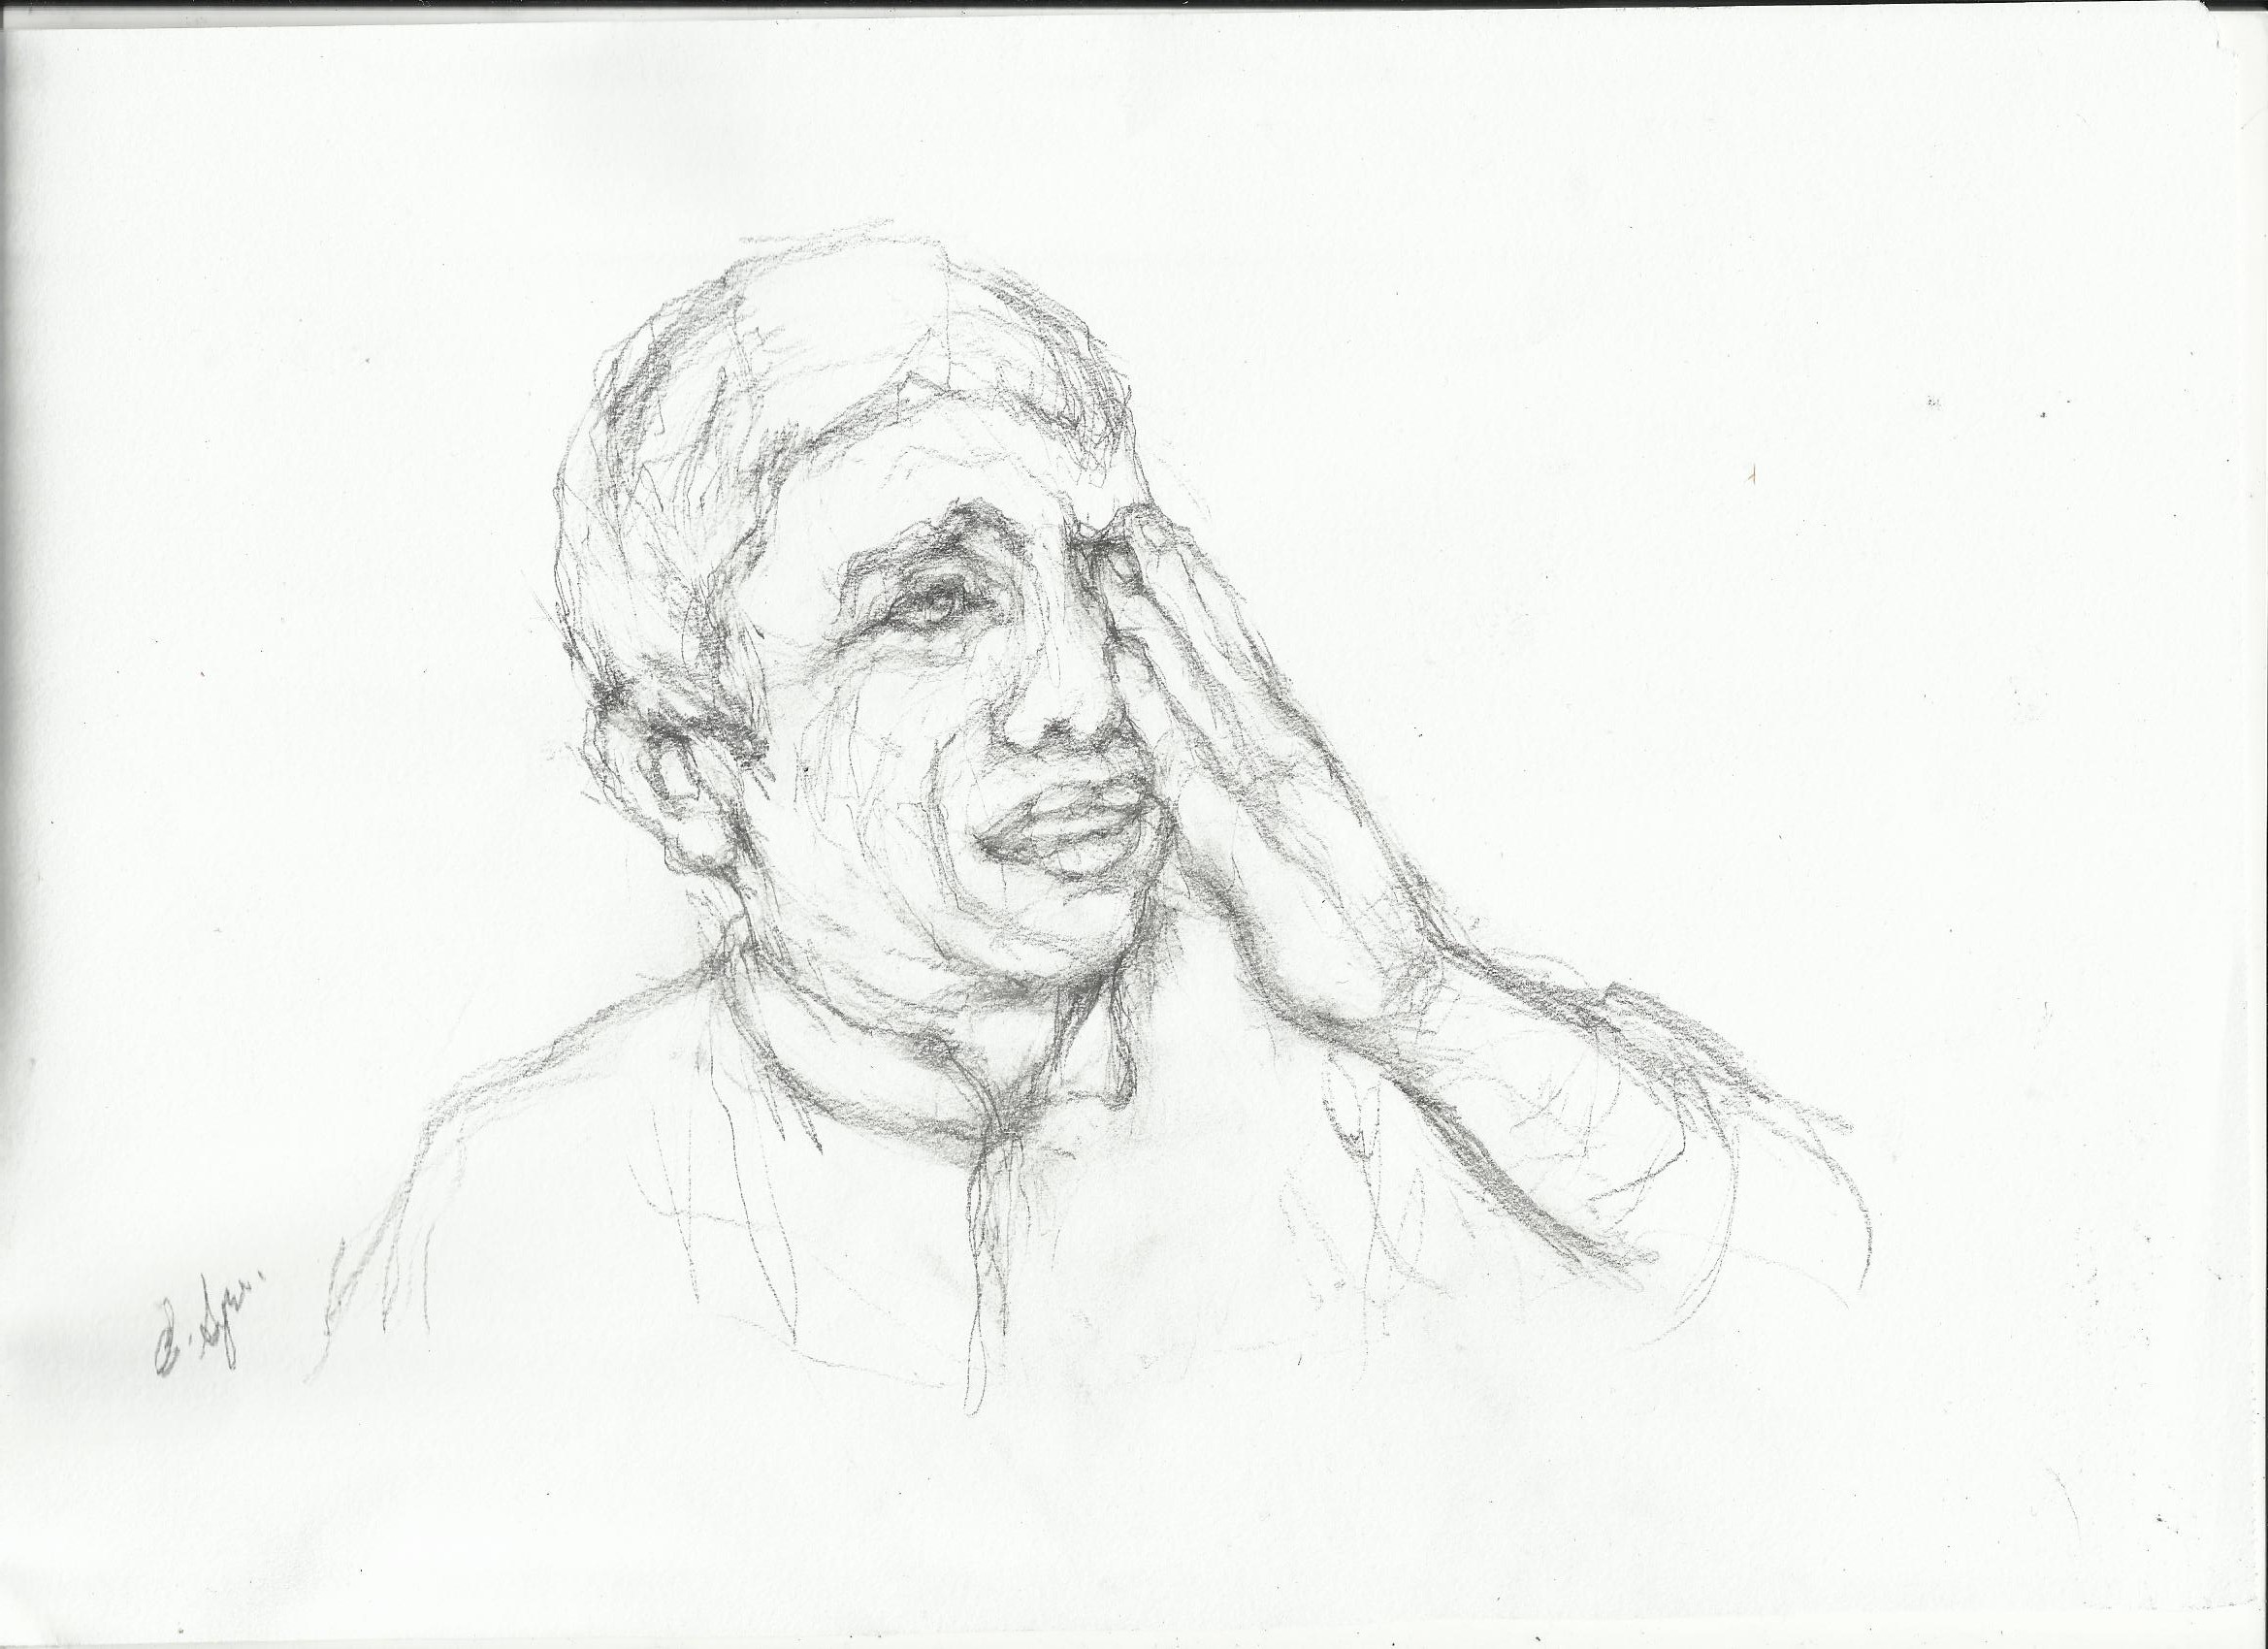 2338x1700 Bear Face Sketch